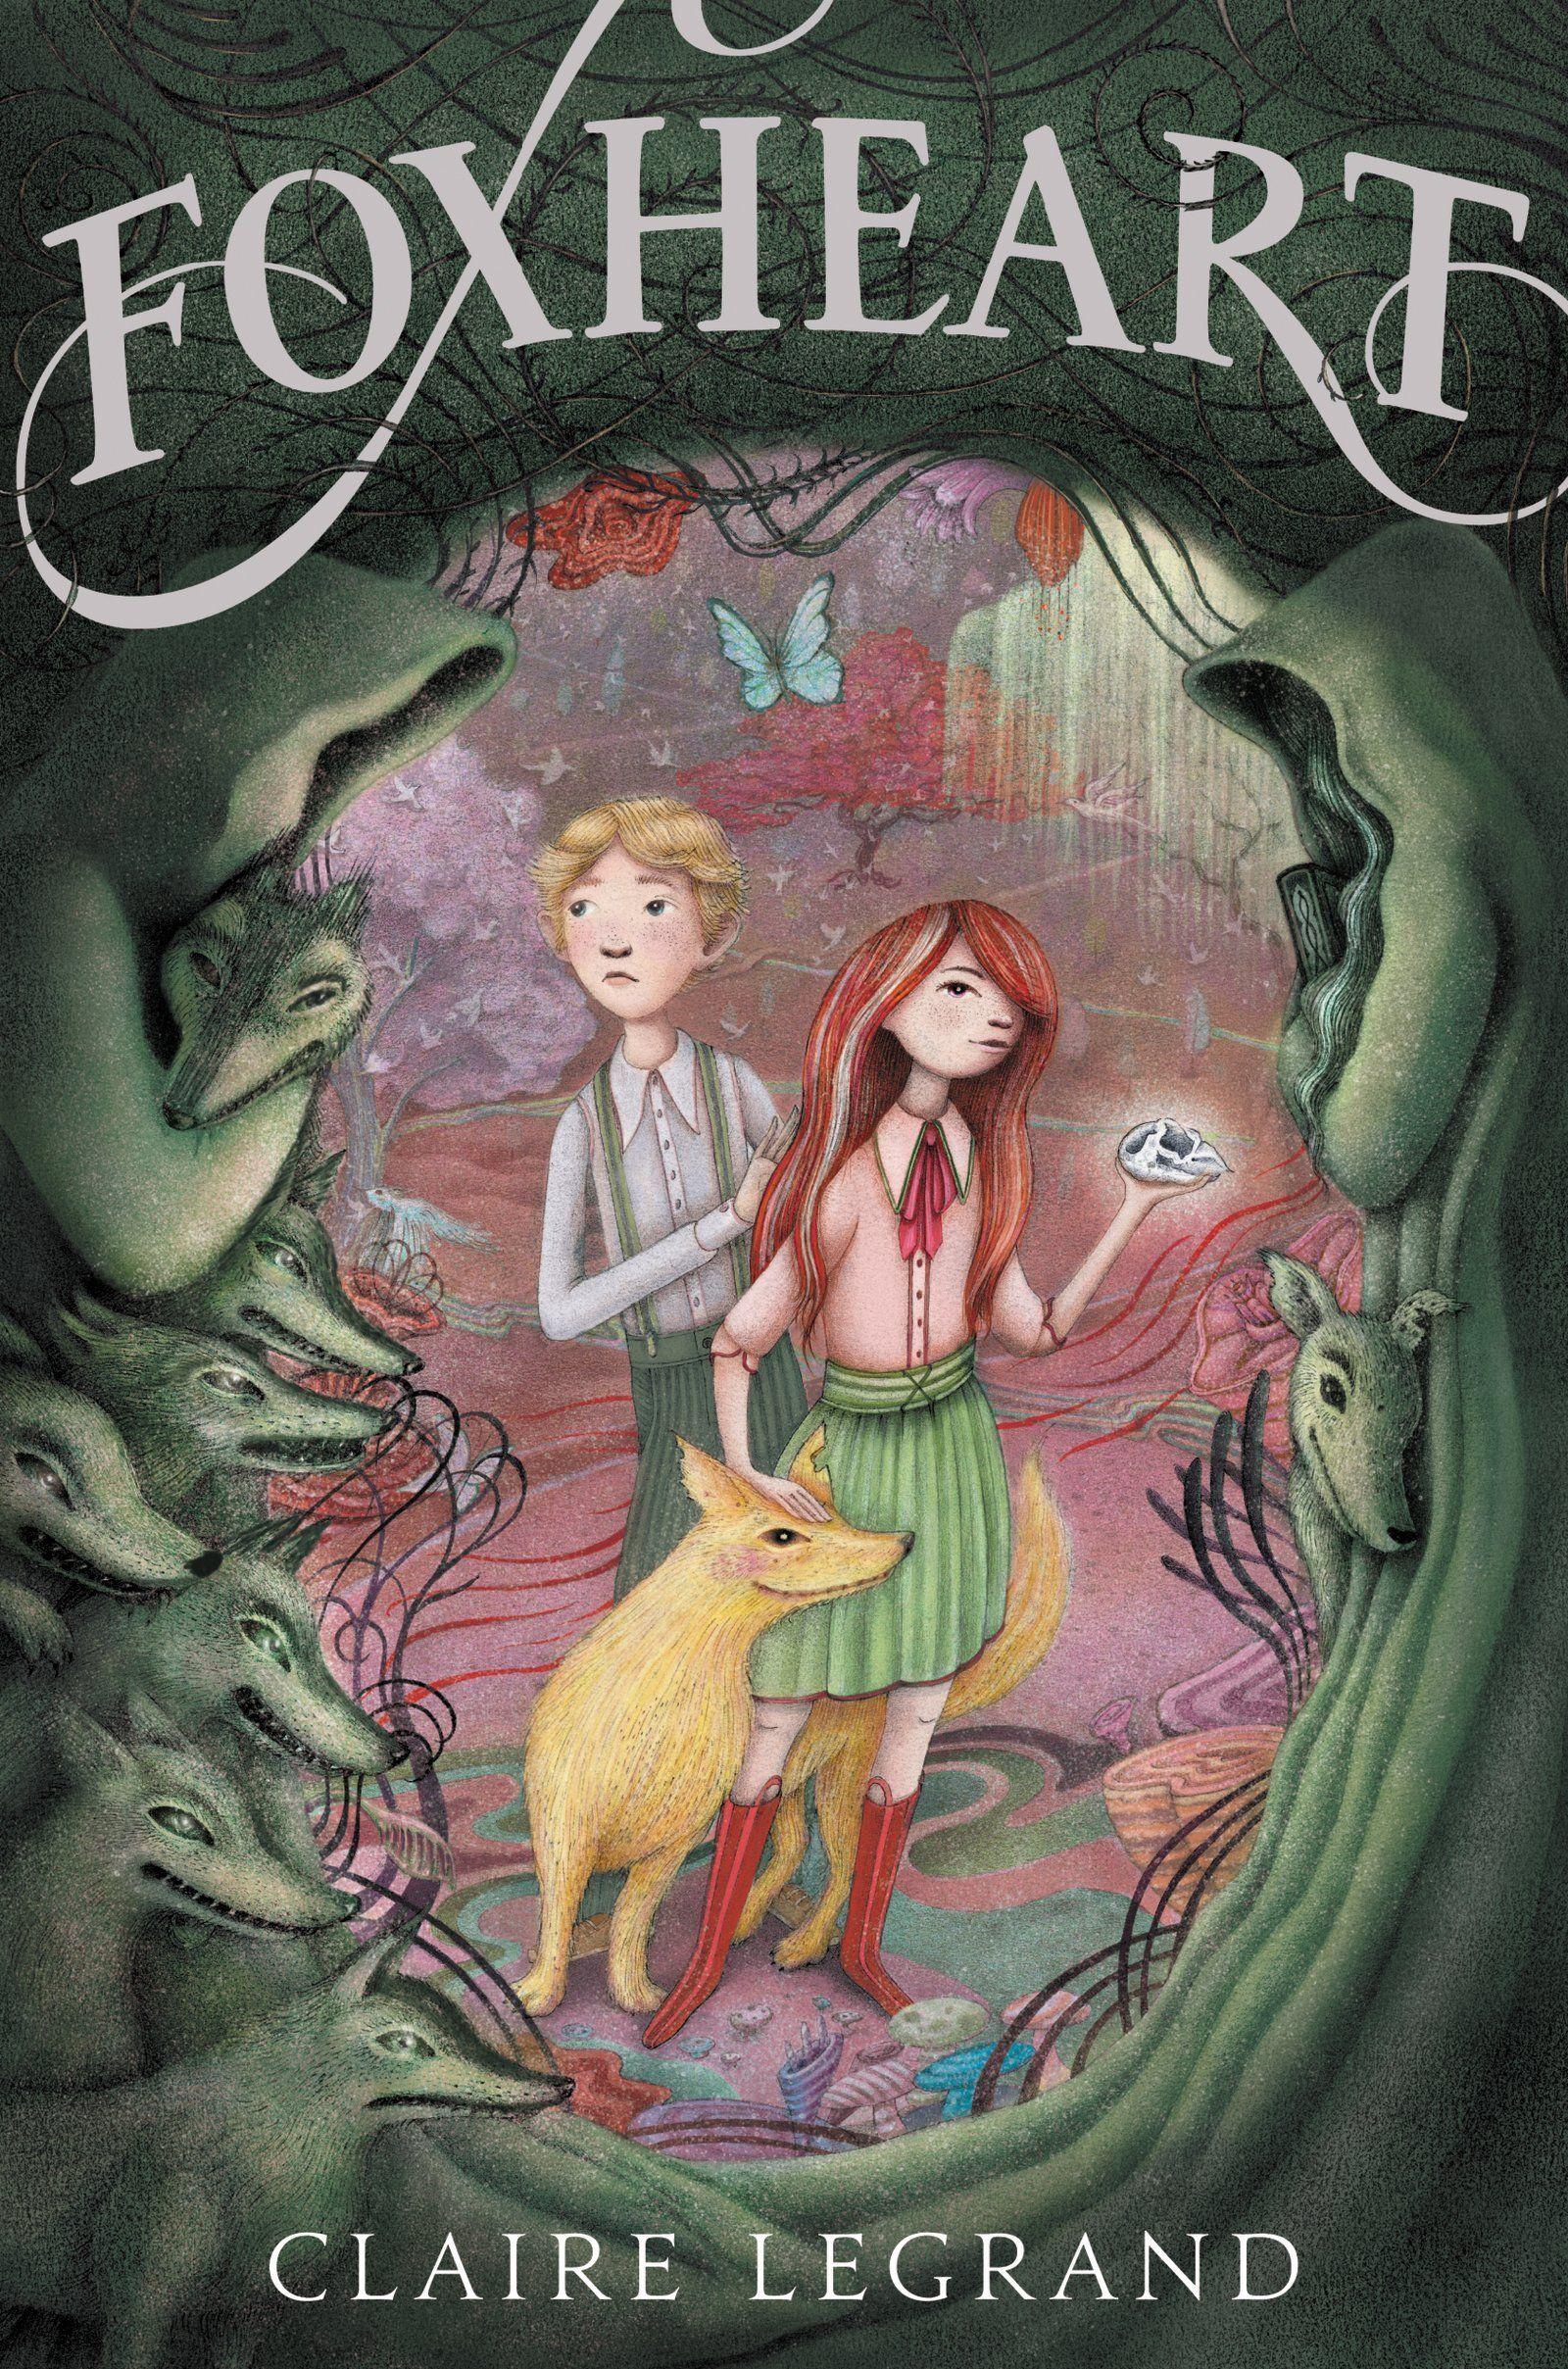 Best Books For 11 Year Olds 6th Grade Educating Children